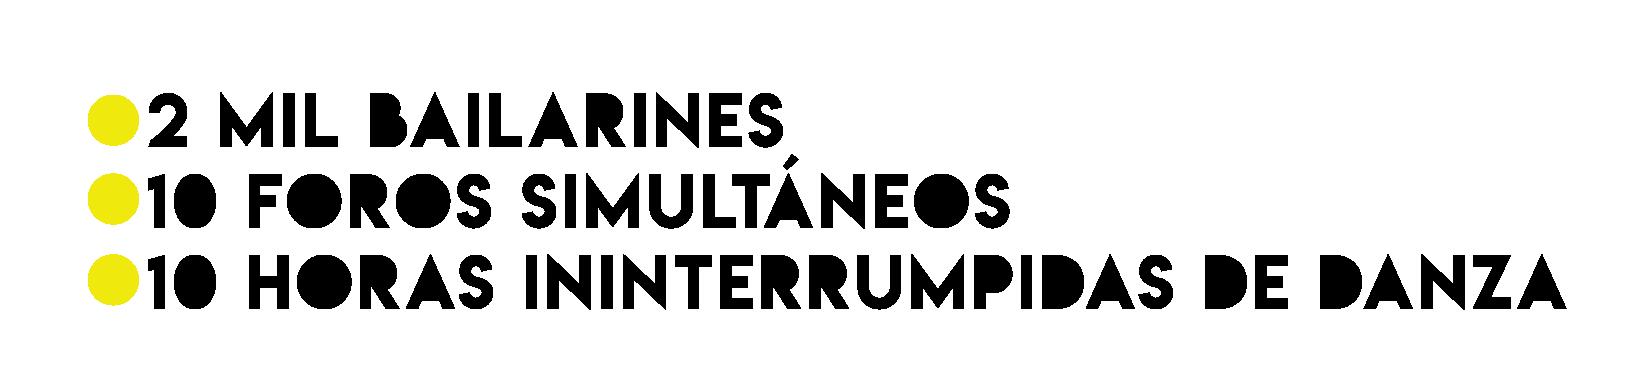 pantallas INFO-11 (1).png